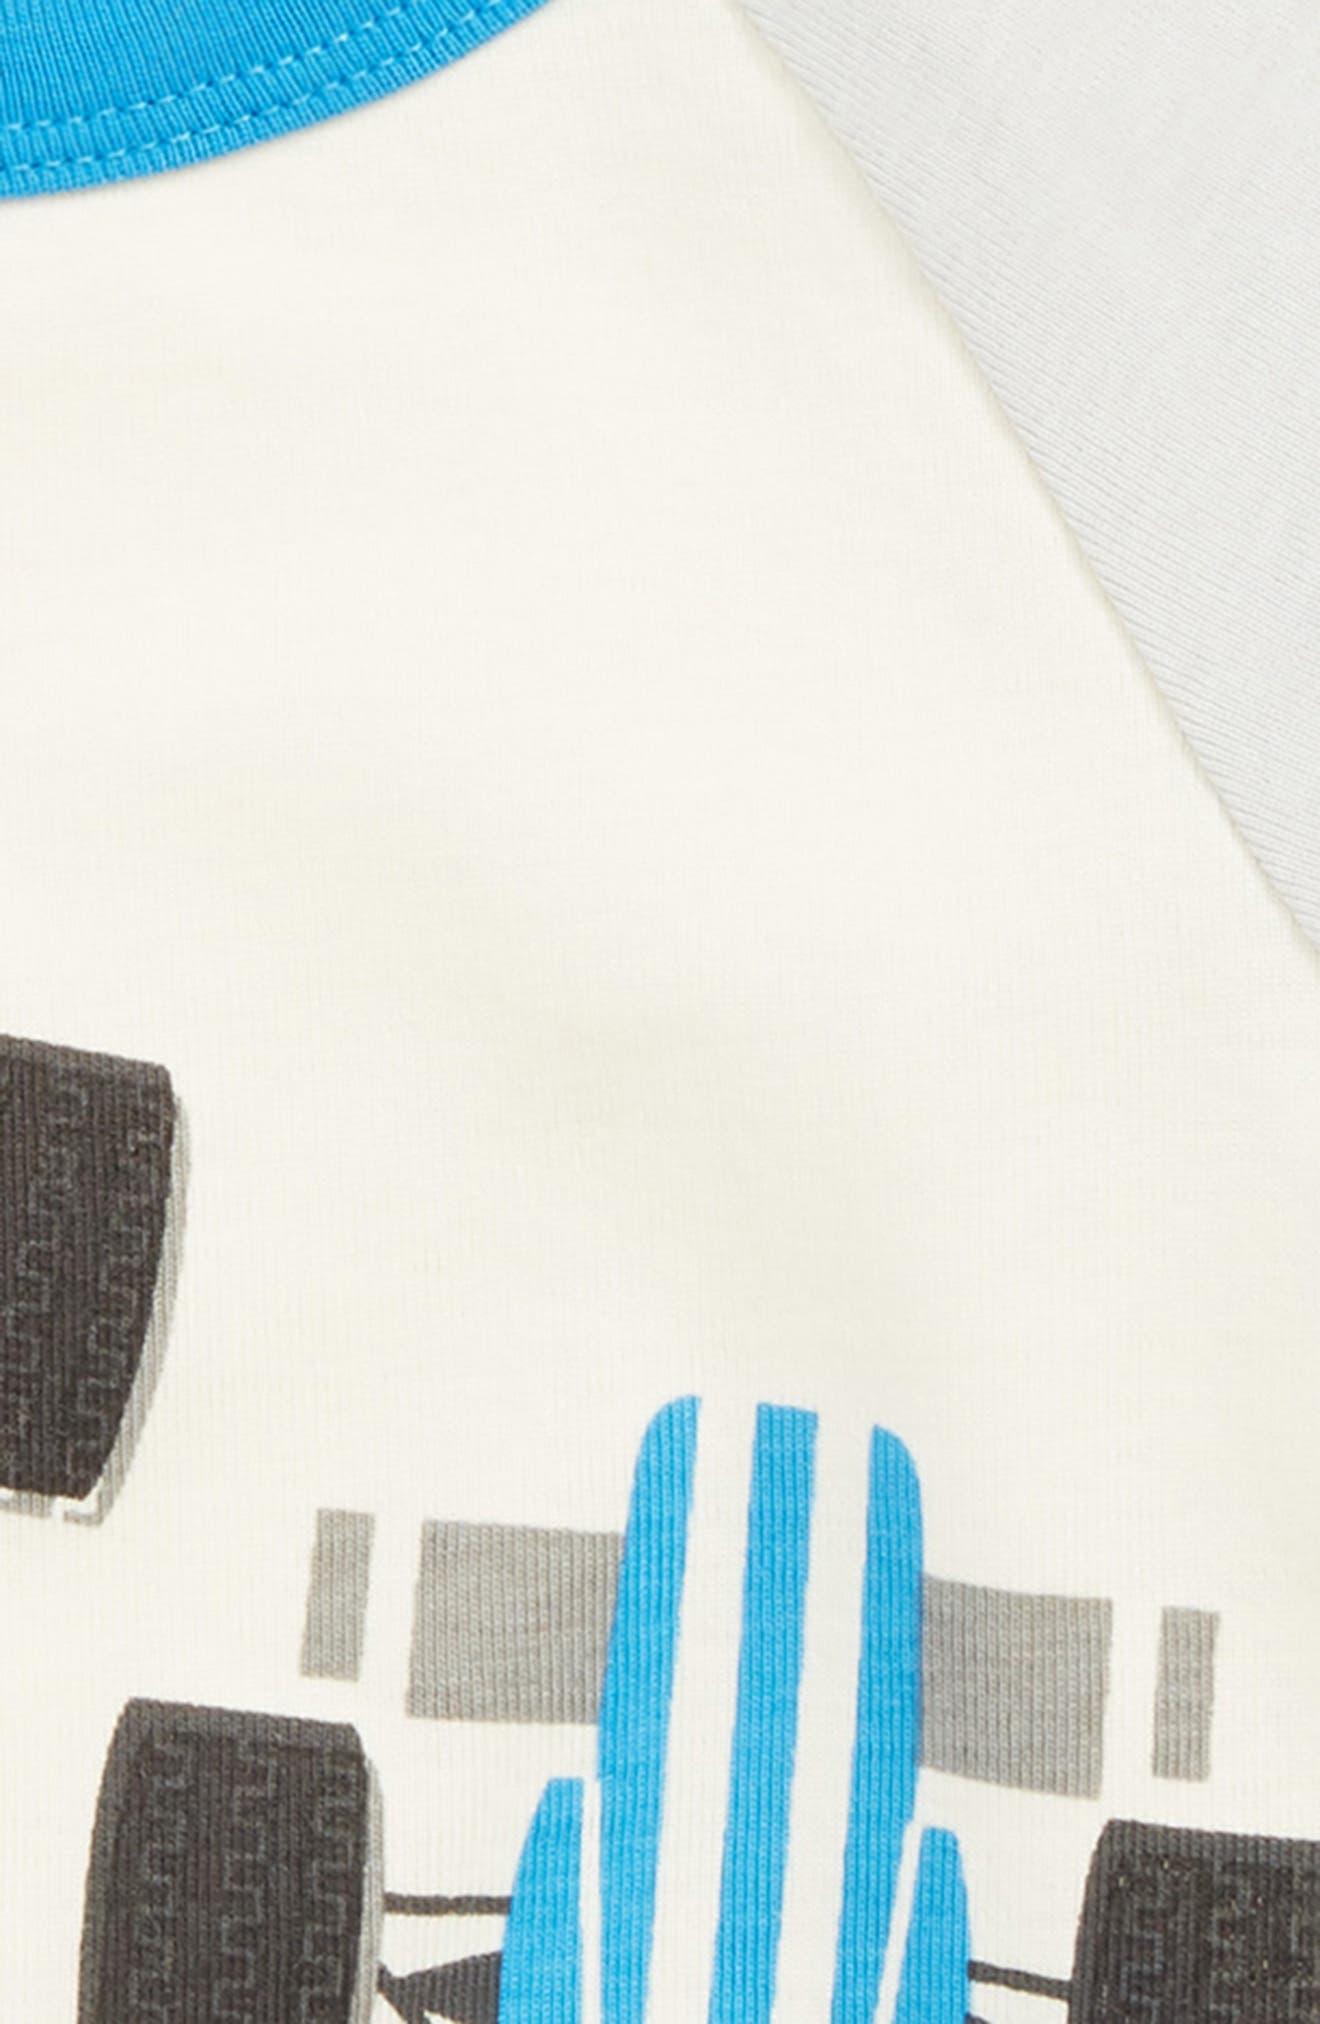 Racecar Print Fitted Two-Piece Pajamas,                             Alternate thumbnail 2, color,                             RACE CAR SCRAMBLE